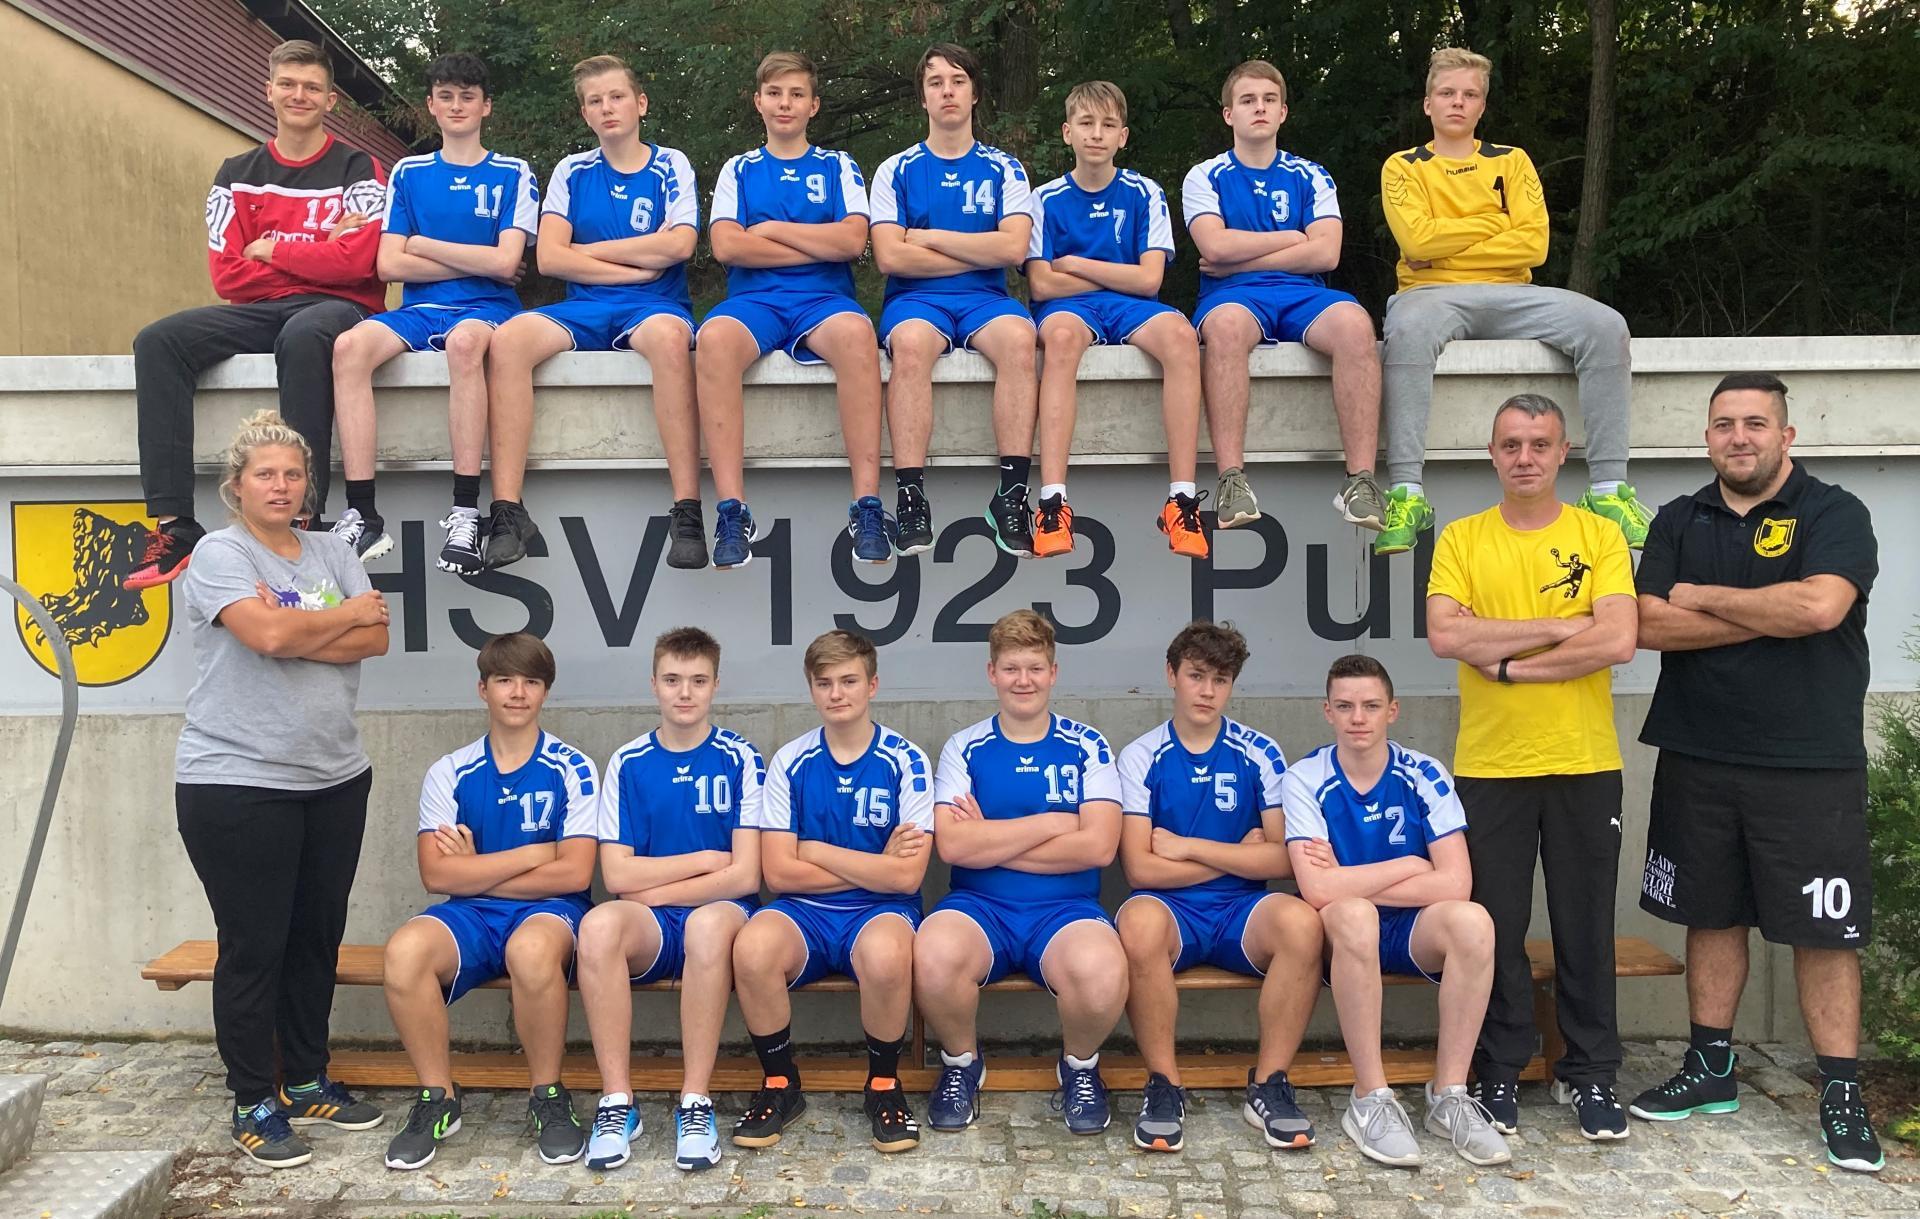 Mannschaftsfoto MJB 2020/21